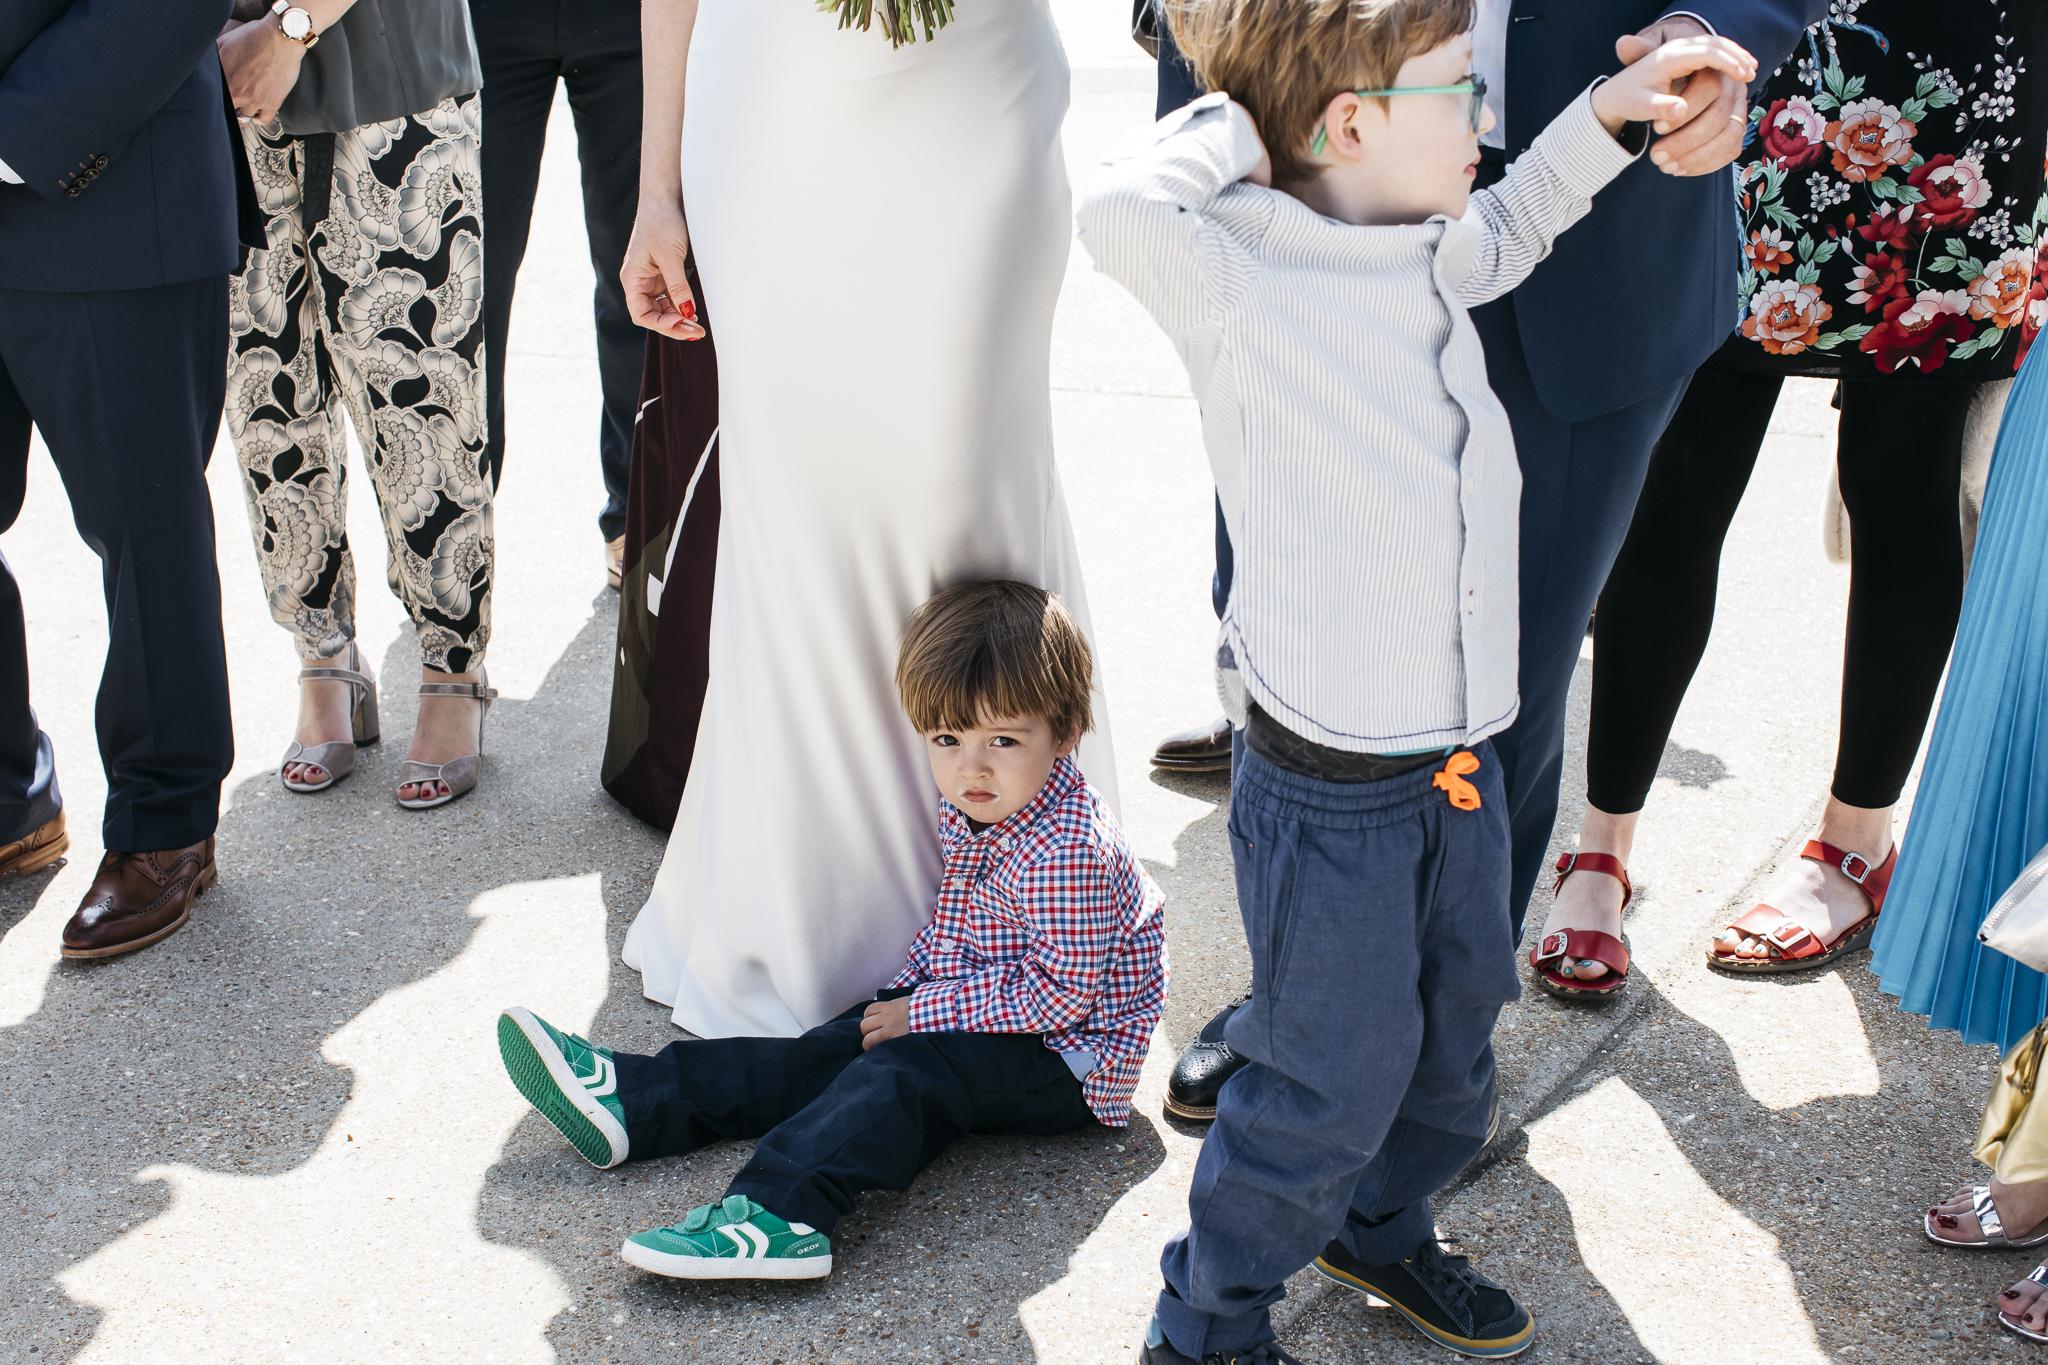 short_coverage_wedding_photographer_brighton_033.jpg